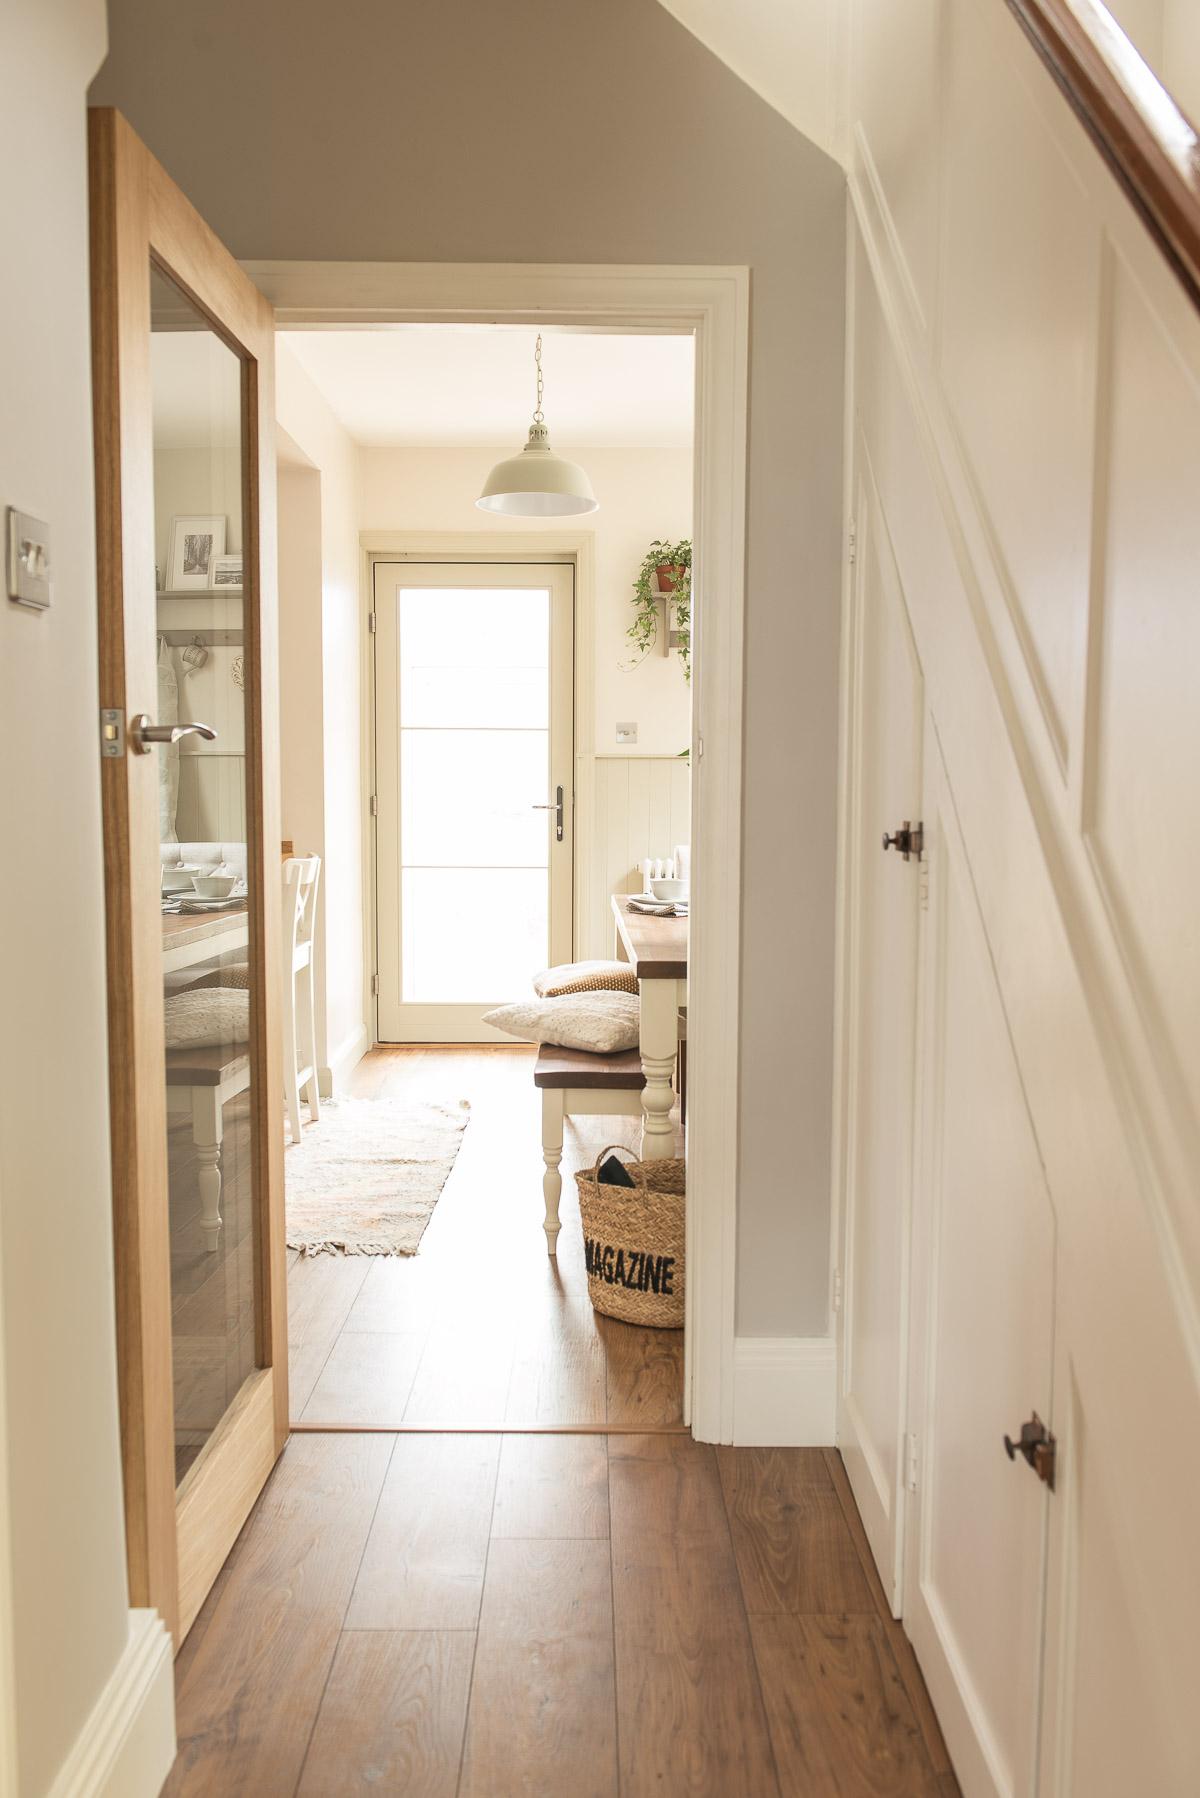 1930s+kitchen+diner+renovation+laminate+wood+flooring.jpeg